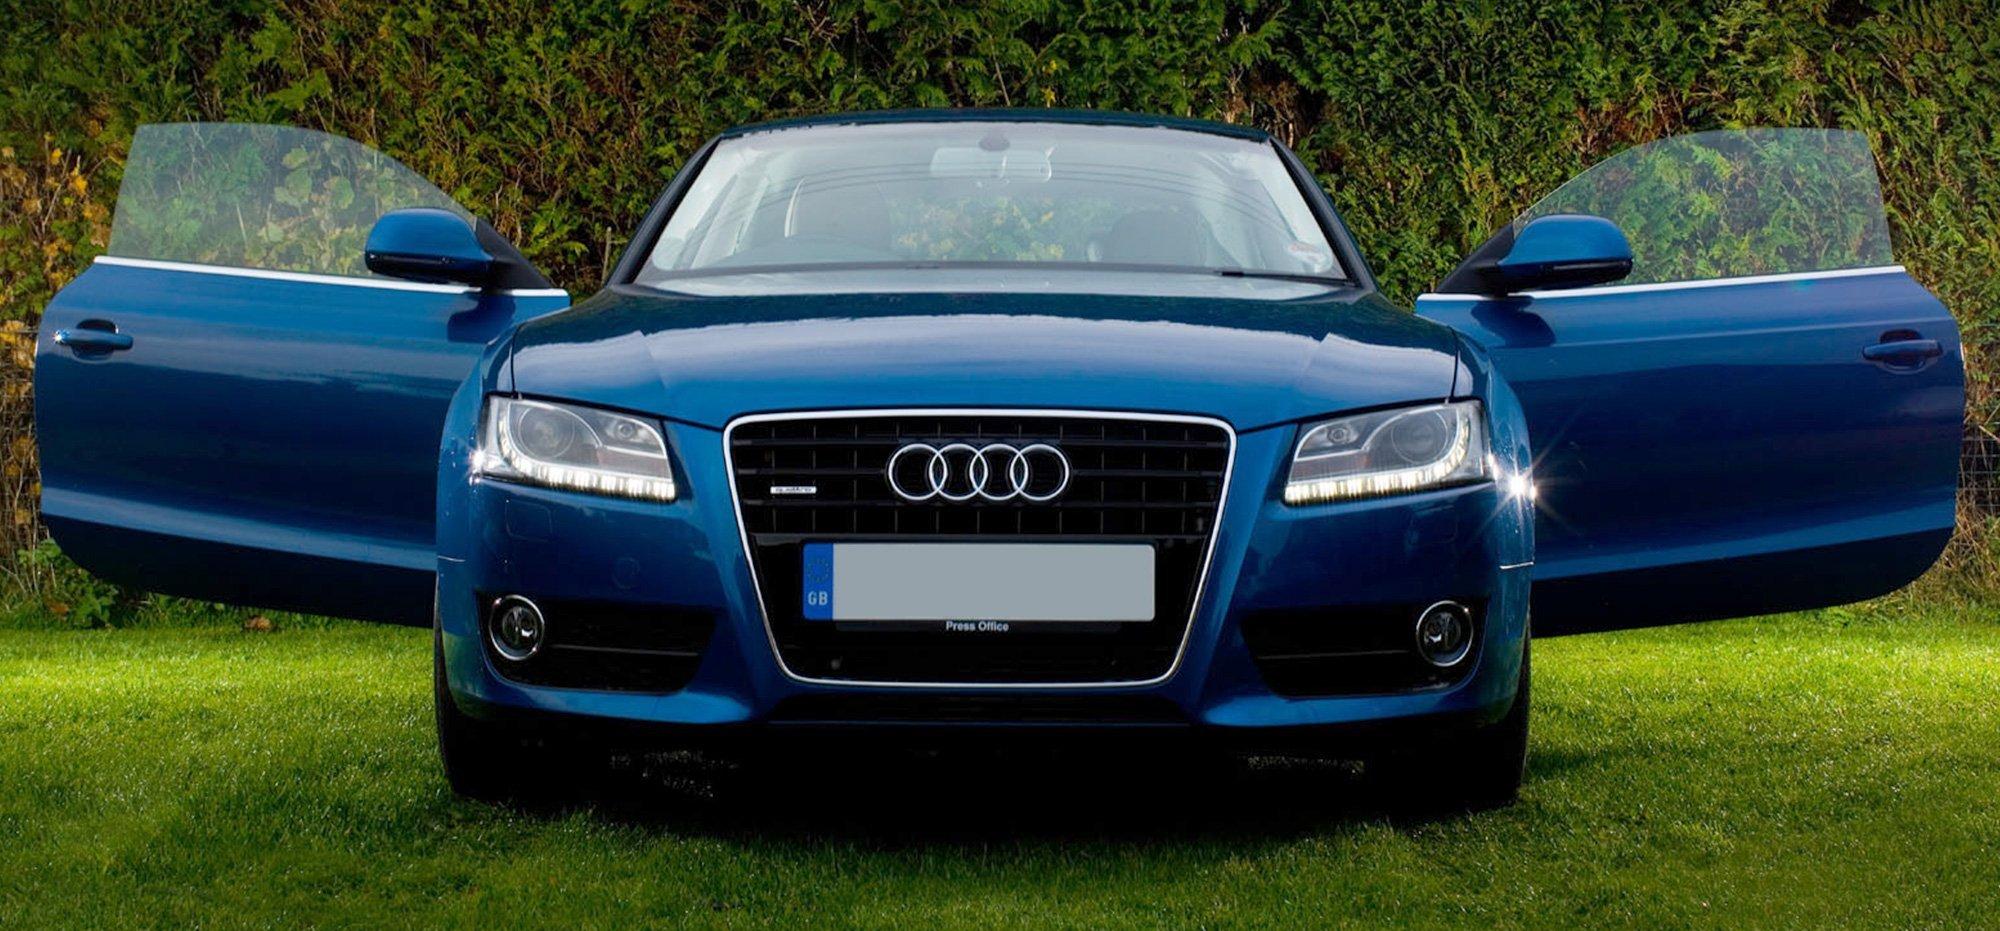 Blue Audi car